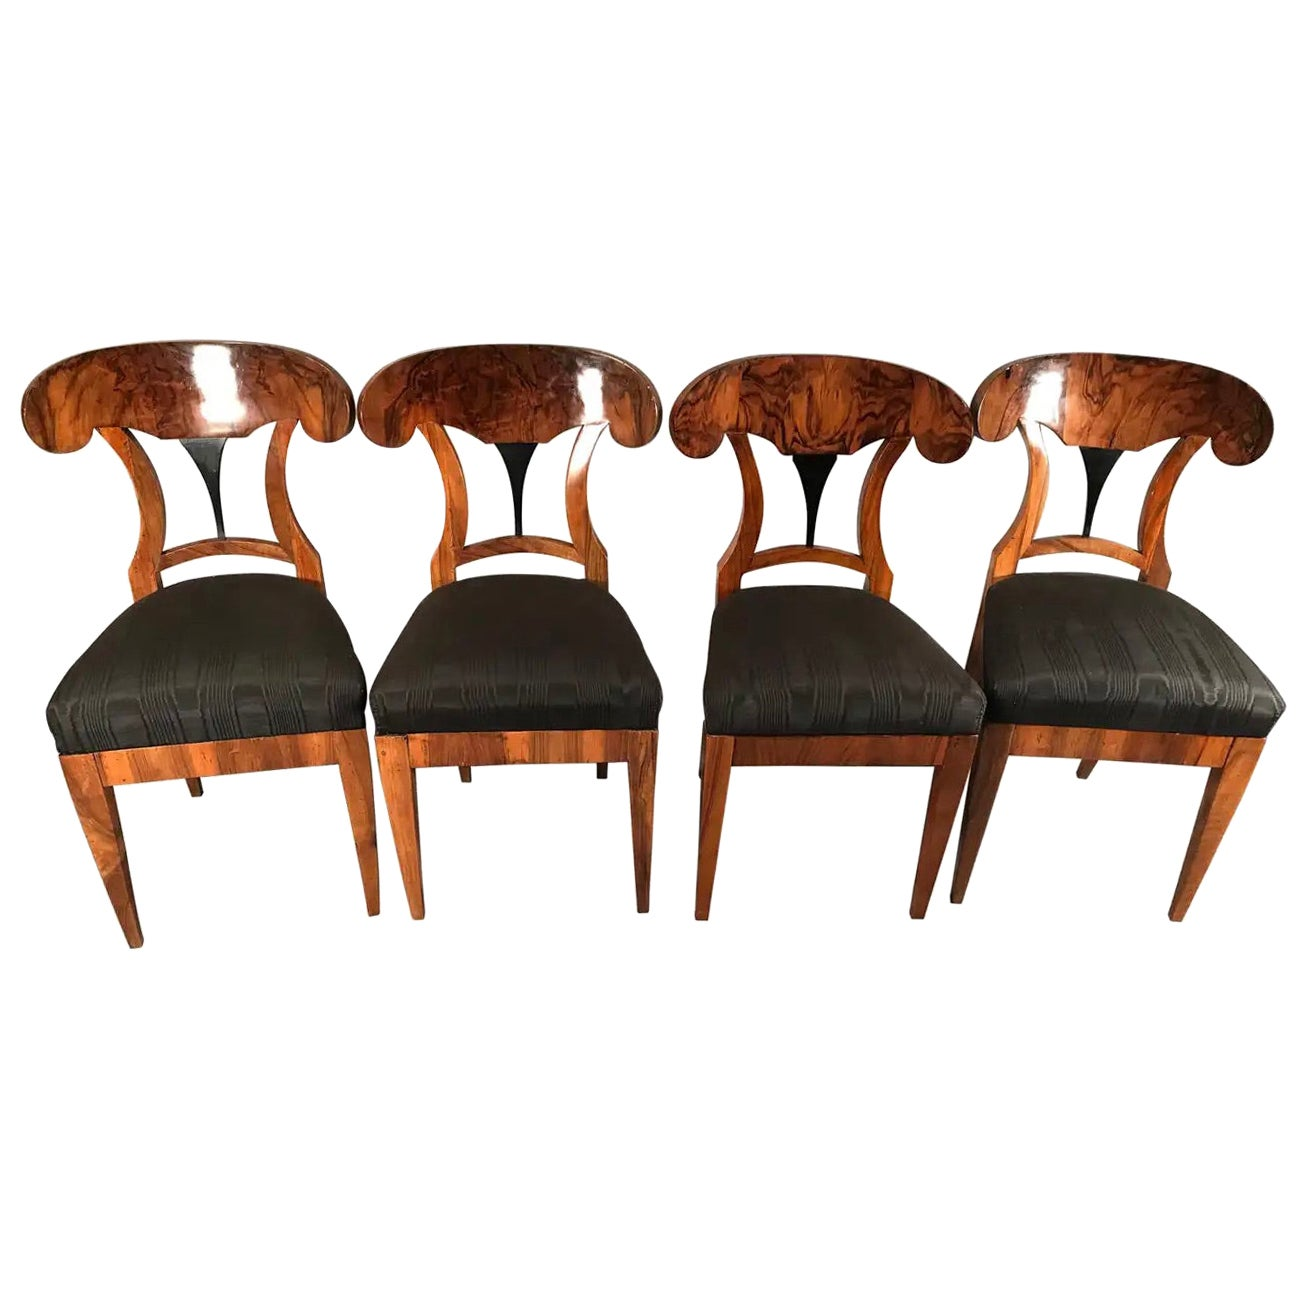 Set of Four Biedermeier Chairs, South Germany 1820